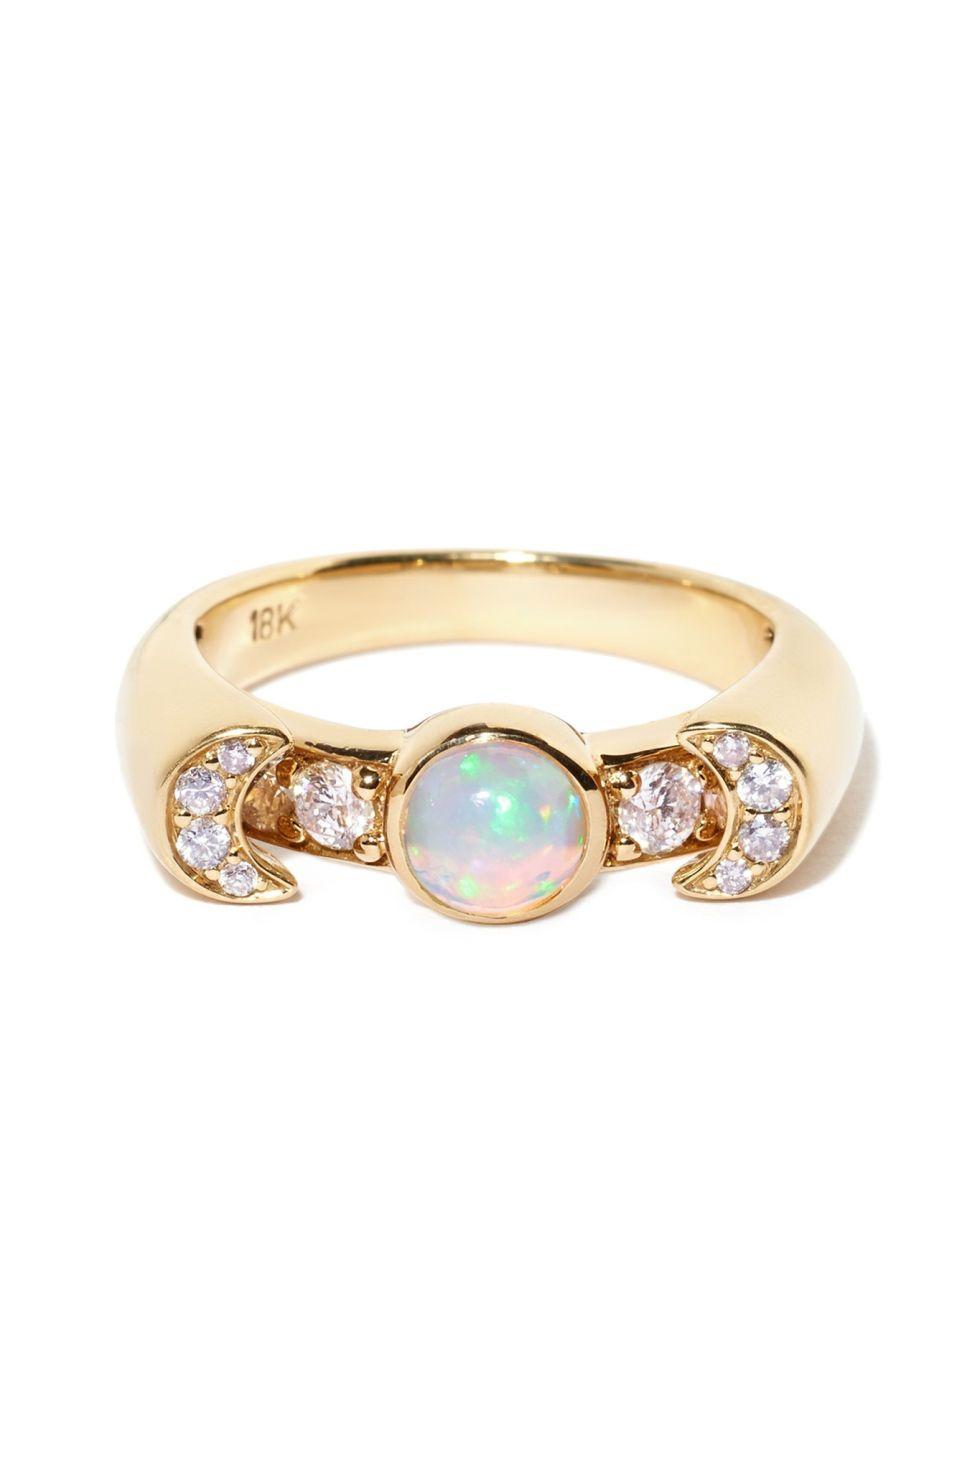 Cheap Engagement Rings Under $6000 - Alternative Engagement Rings for Women